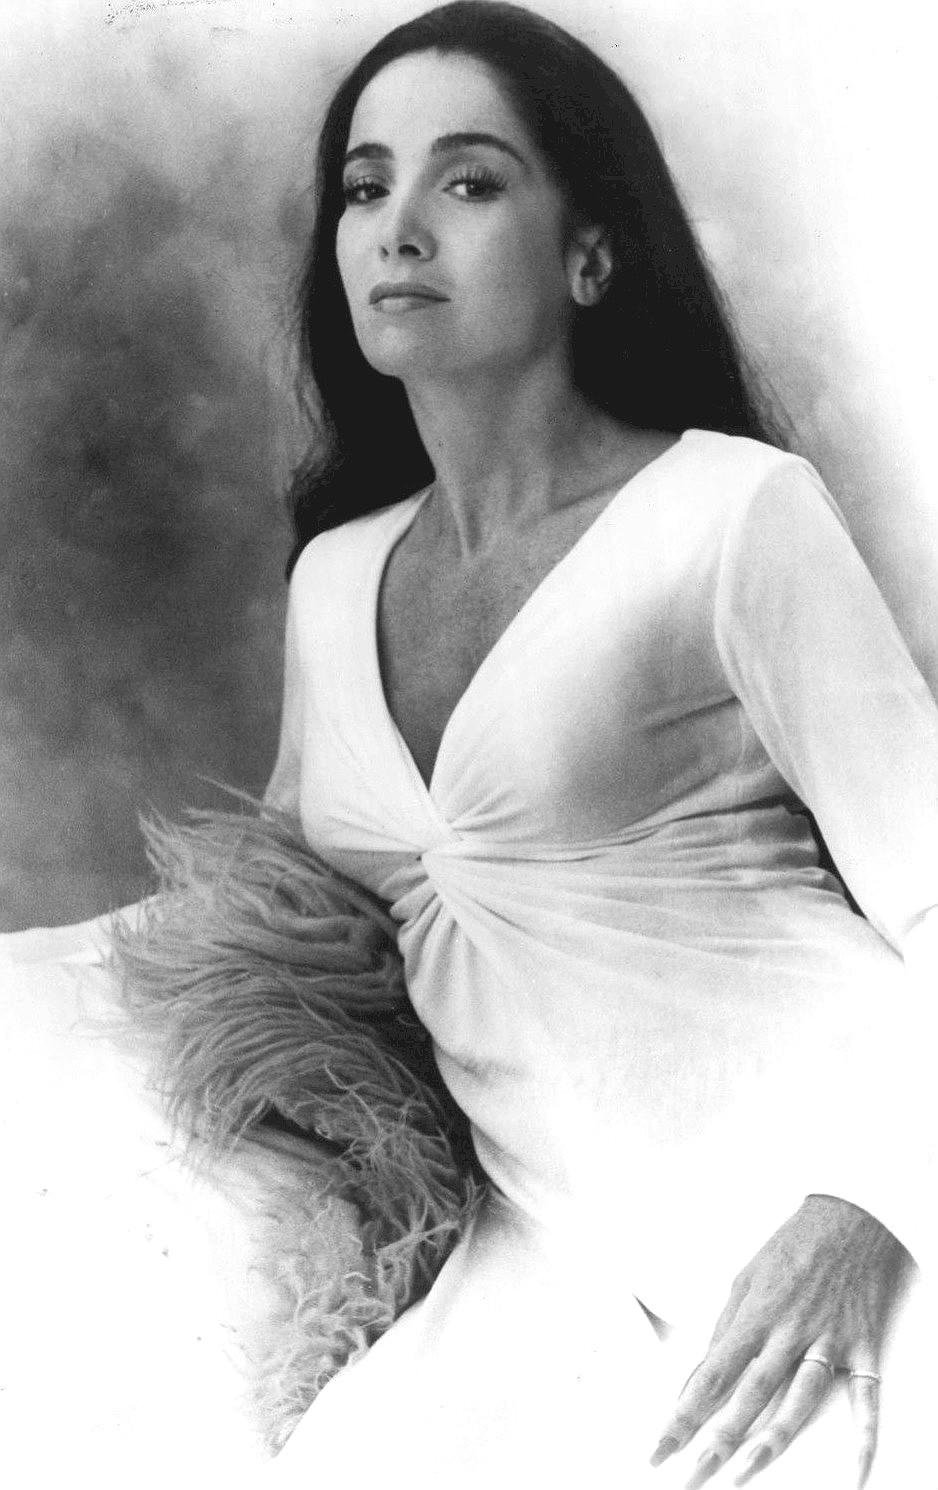 File:Linda Cristal 1974.jpg - Wikimedia Commons: http://commons.wikimedia.org/wiki/File:Linda_Cristal_1974.jpg